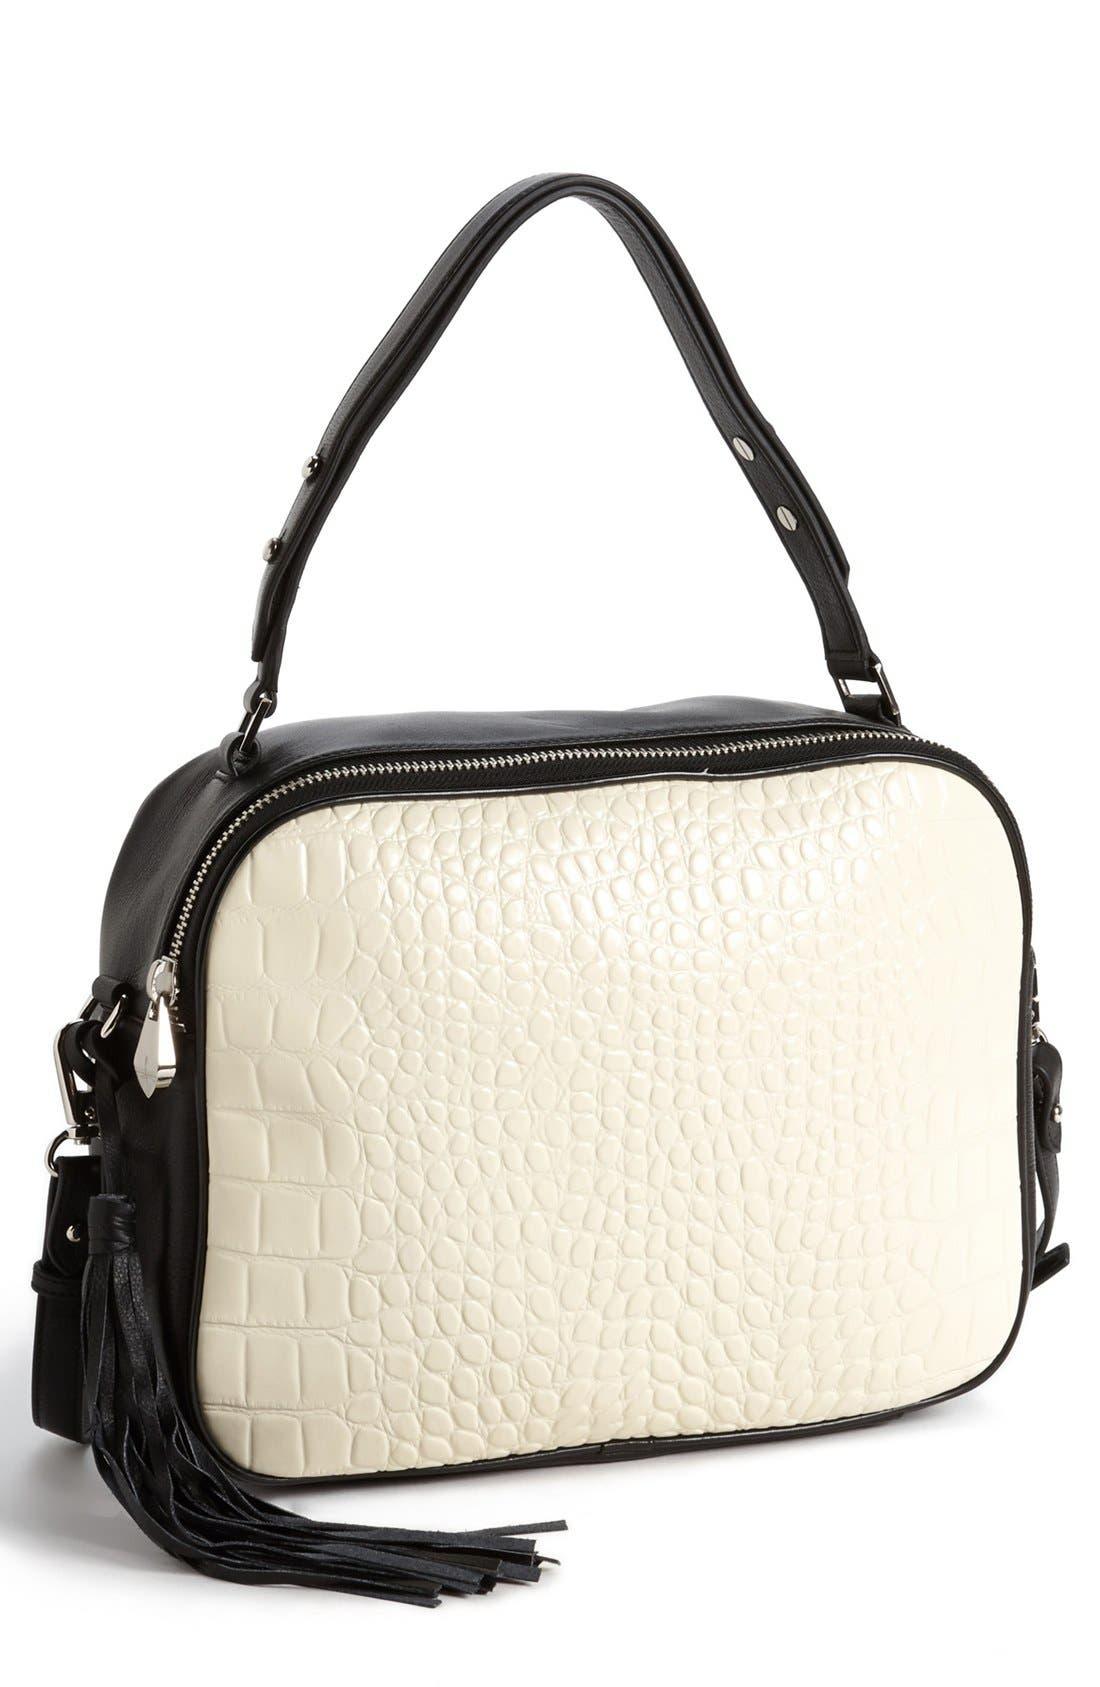 Alternate Image 1 Selected - Pour la Victoire 'Nora' Leather Crossbody Bag